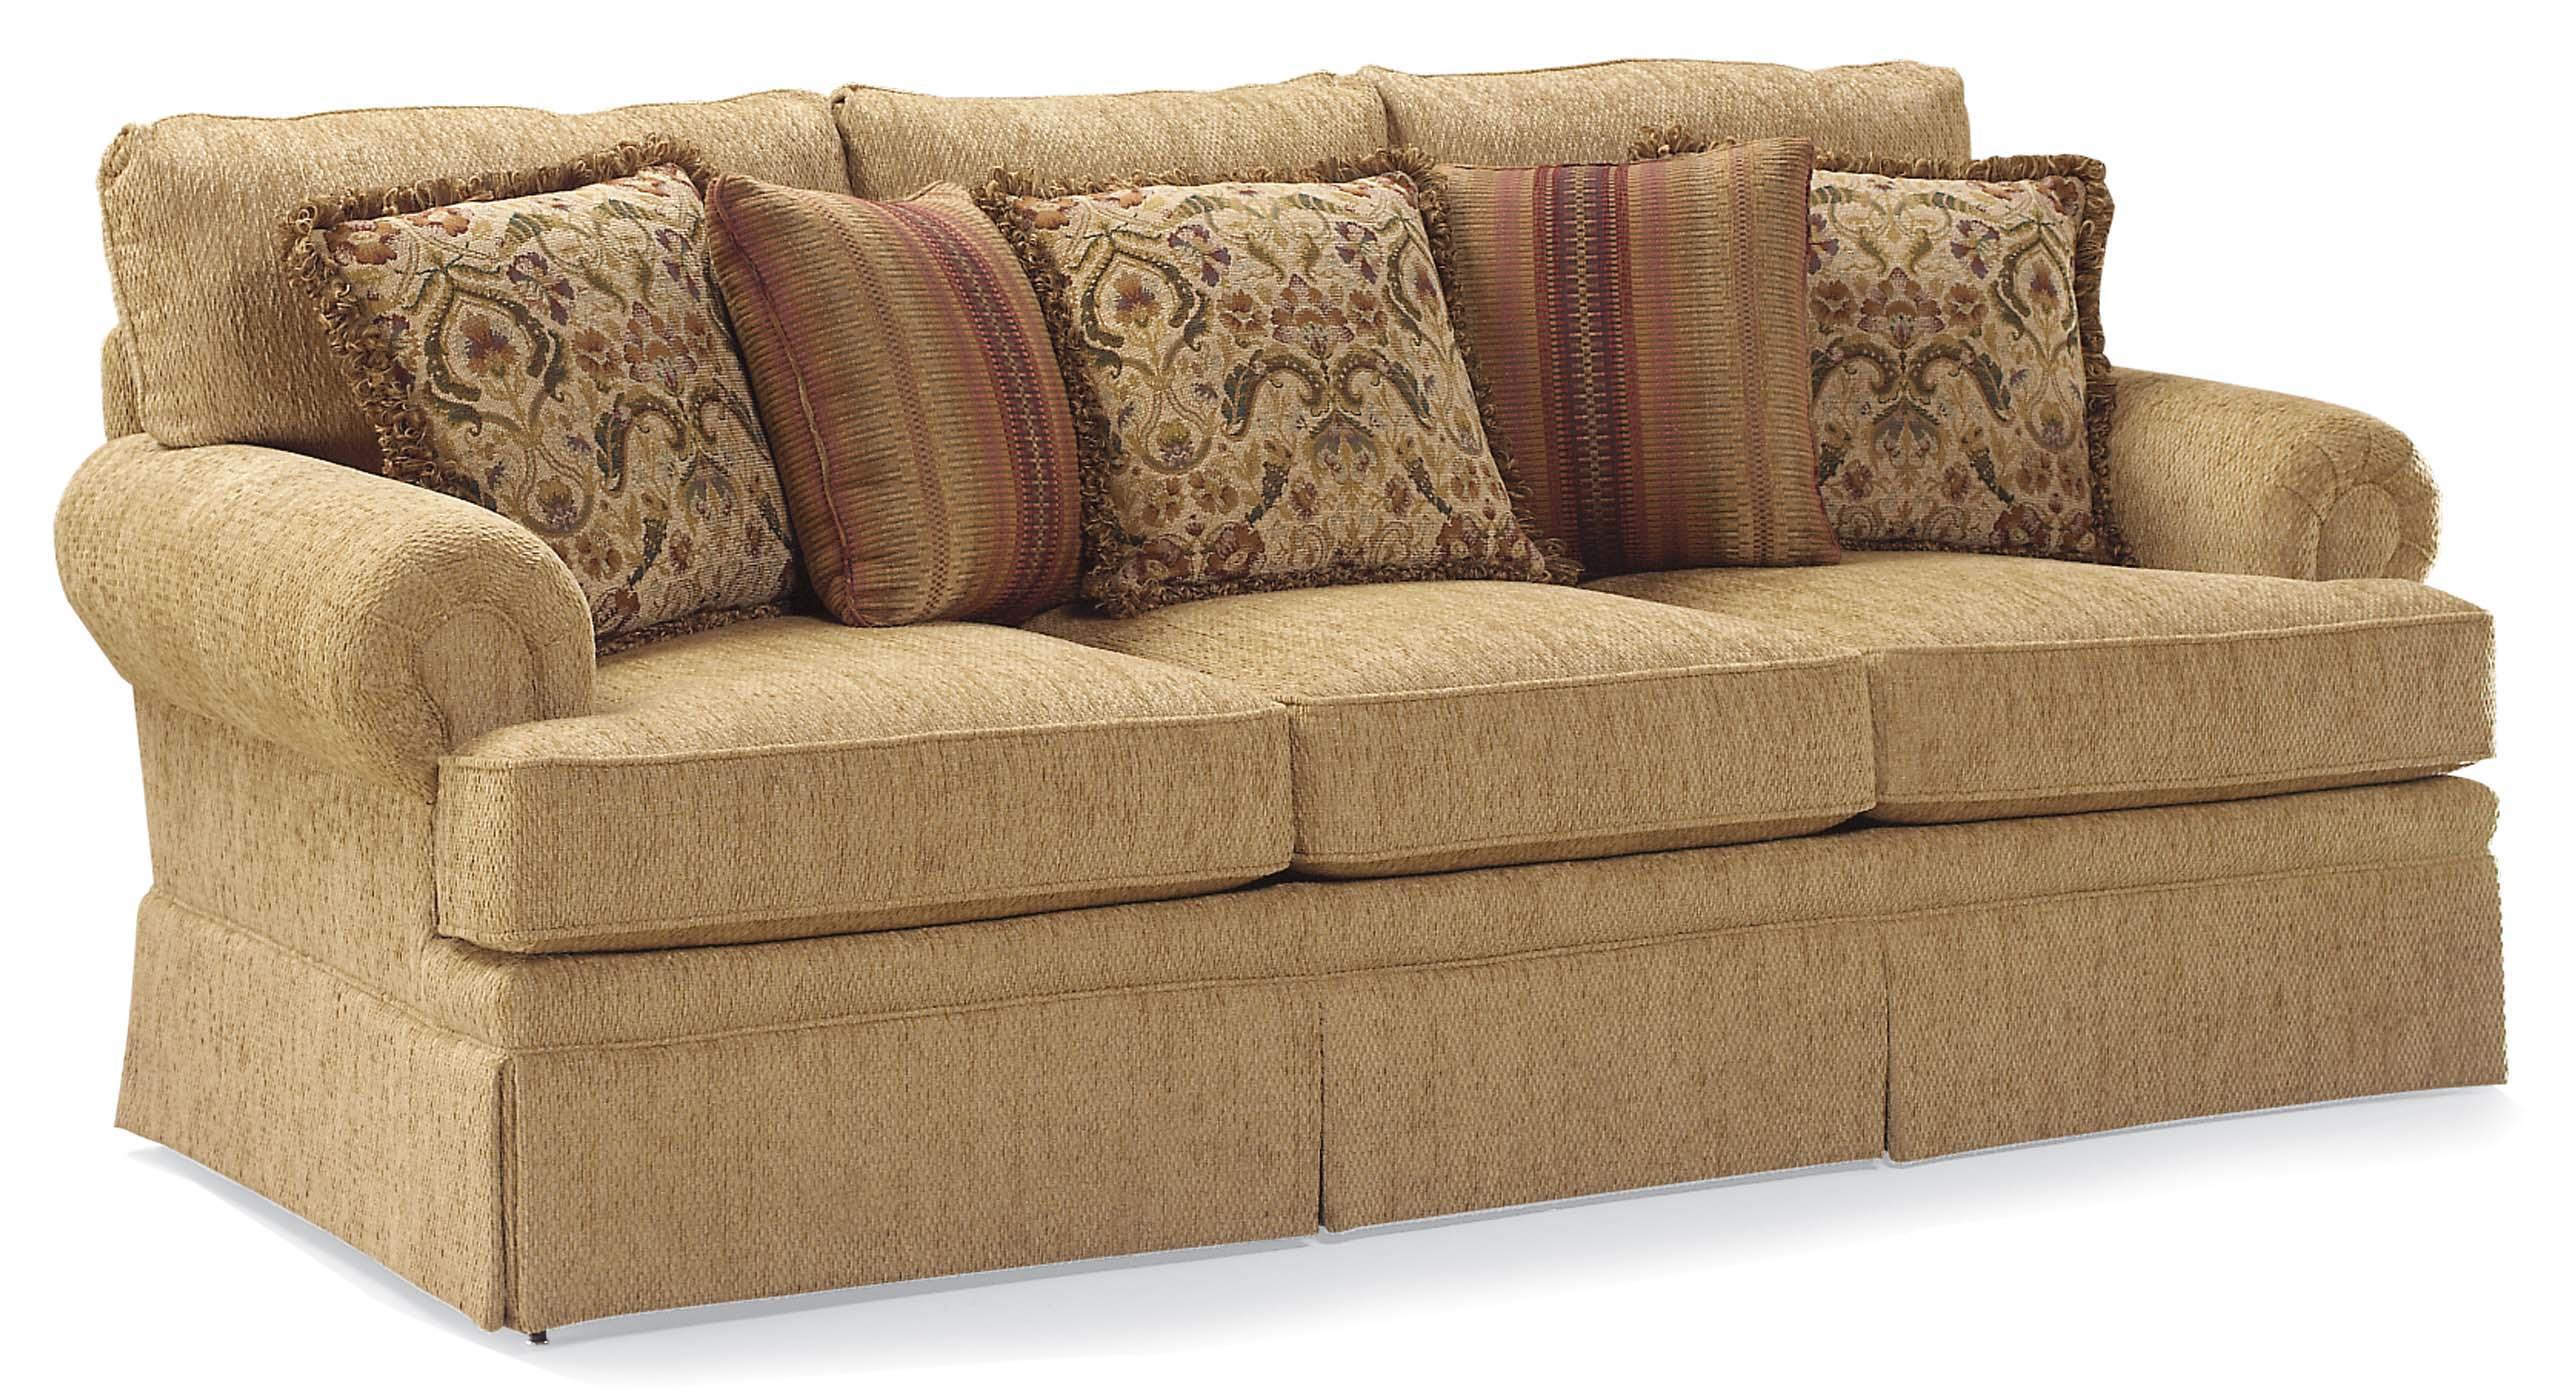 Fairfield 3736 Skirted Stationary Sofa With Loose Accent Pillows Ahfa Dealer Locator